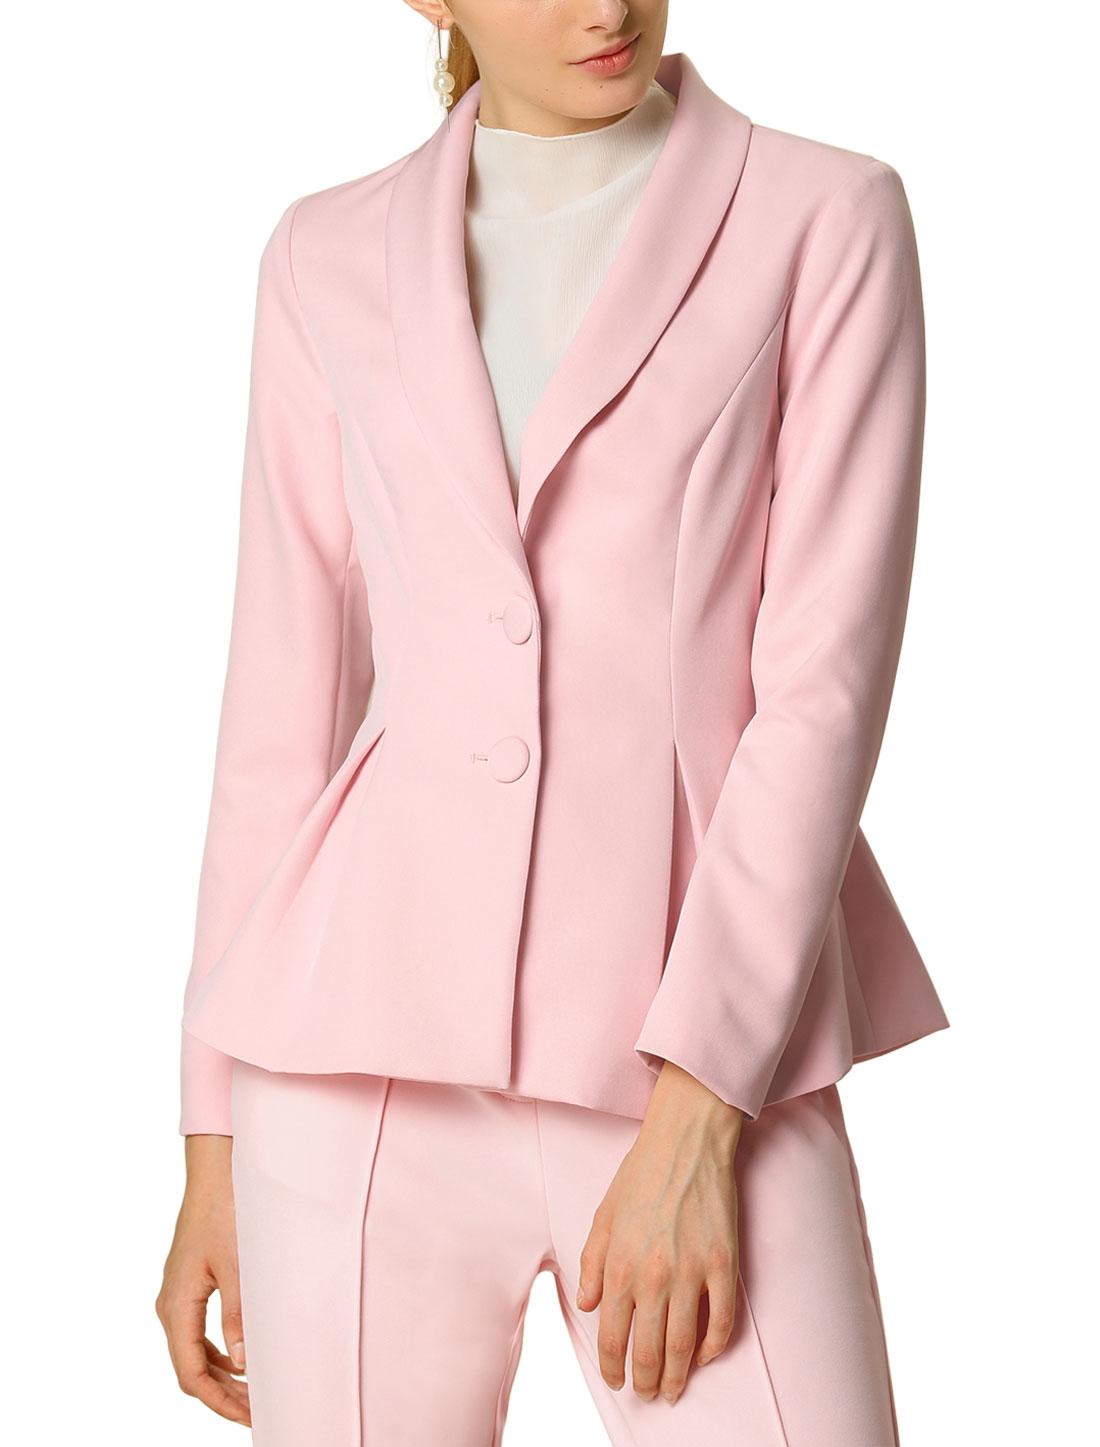 Women's Casual Lapel Collar Elegant Button Work Office Blazer Pink XS (US 2)